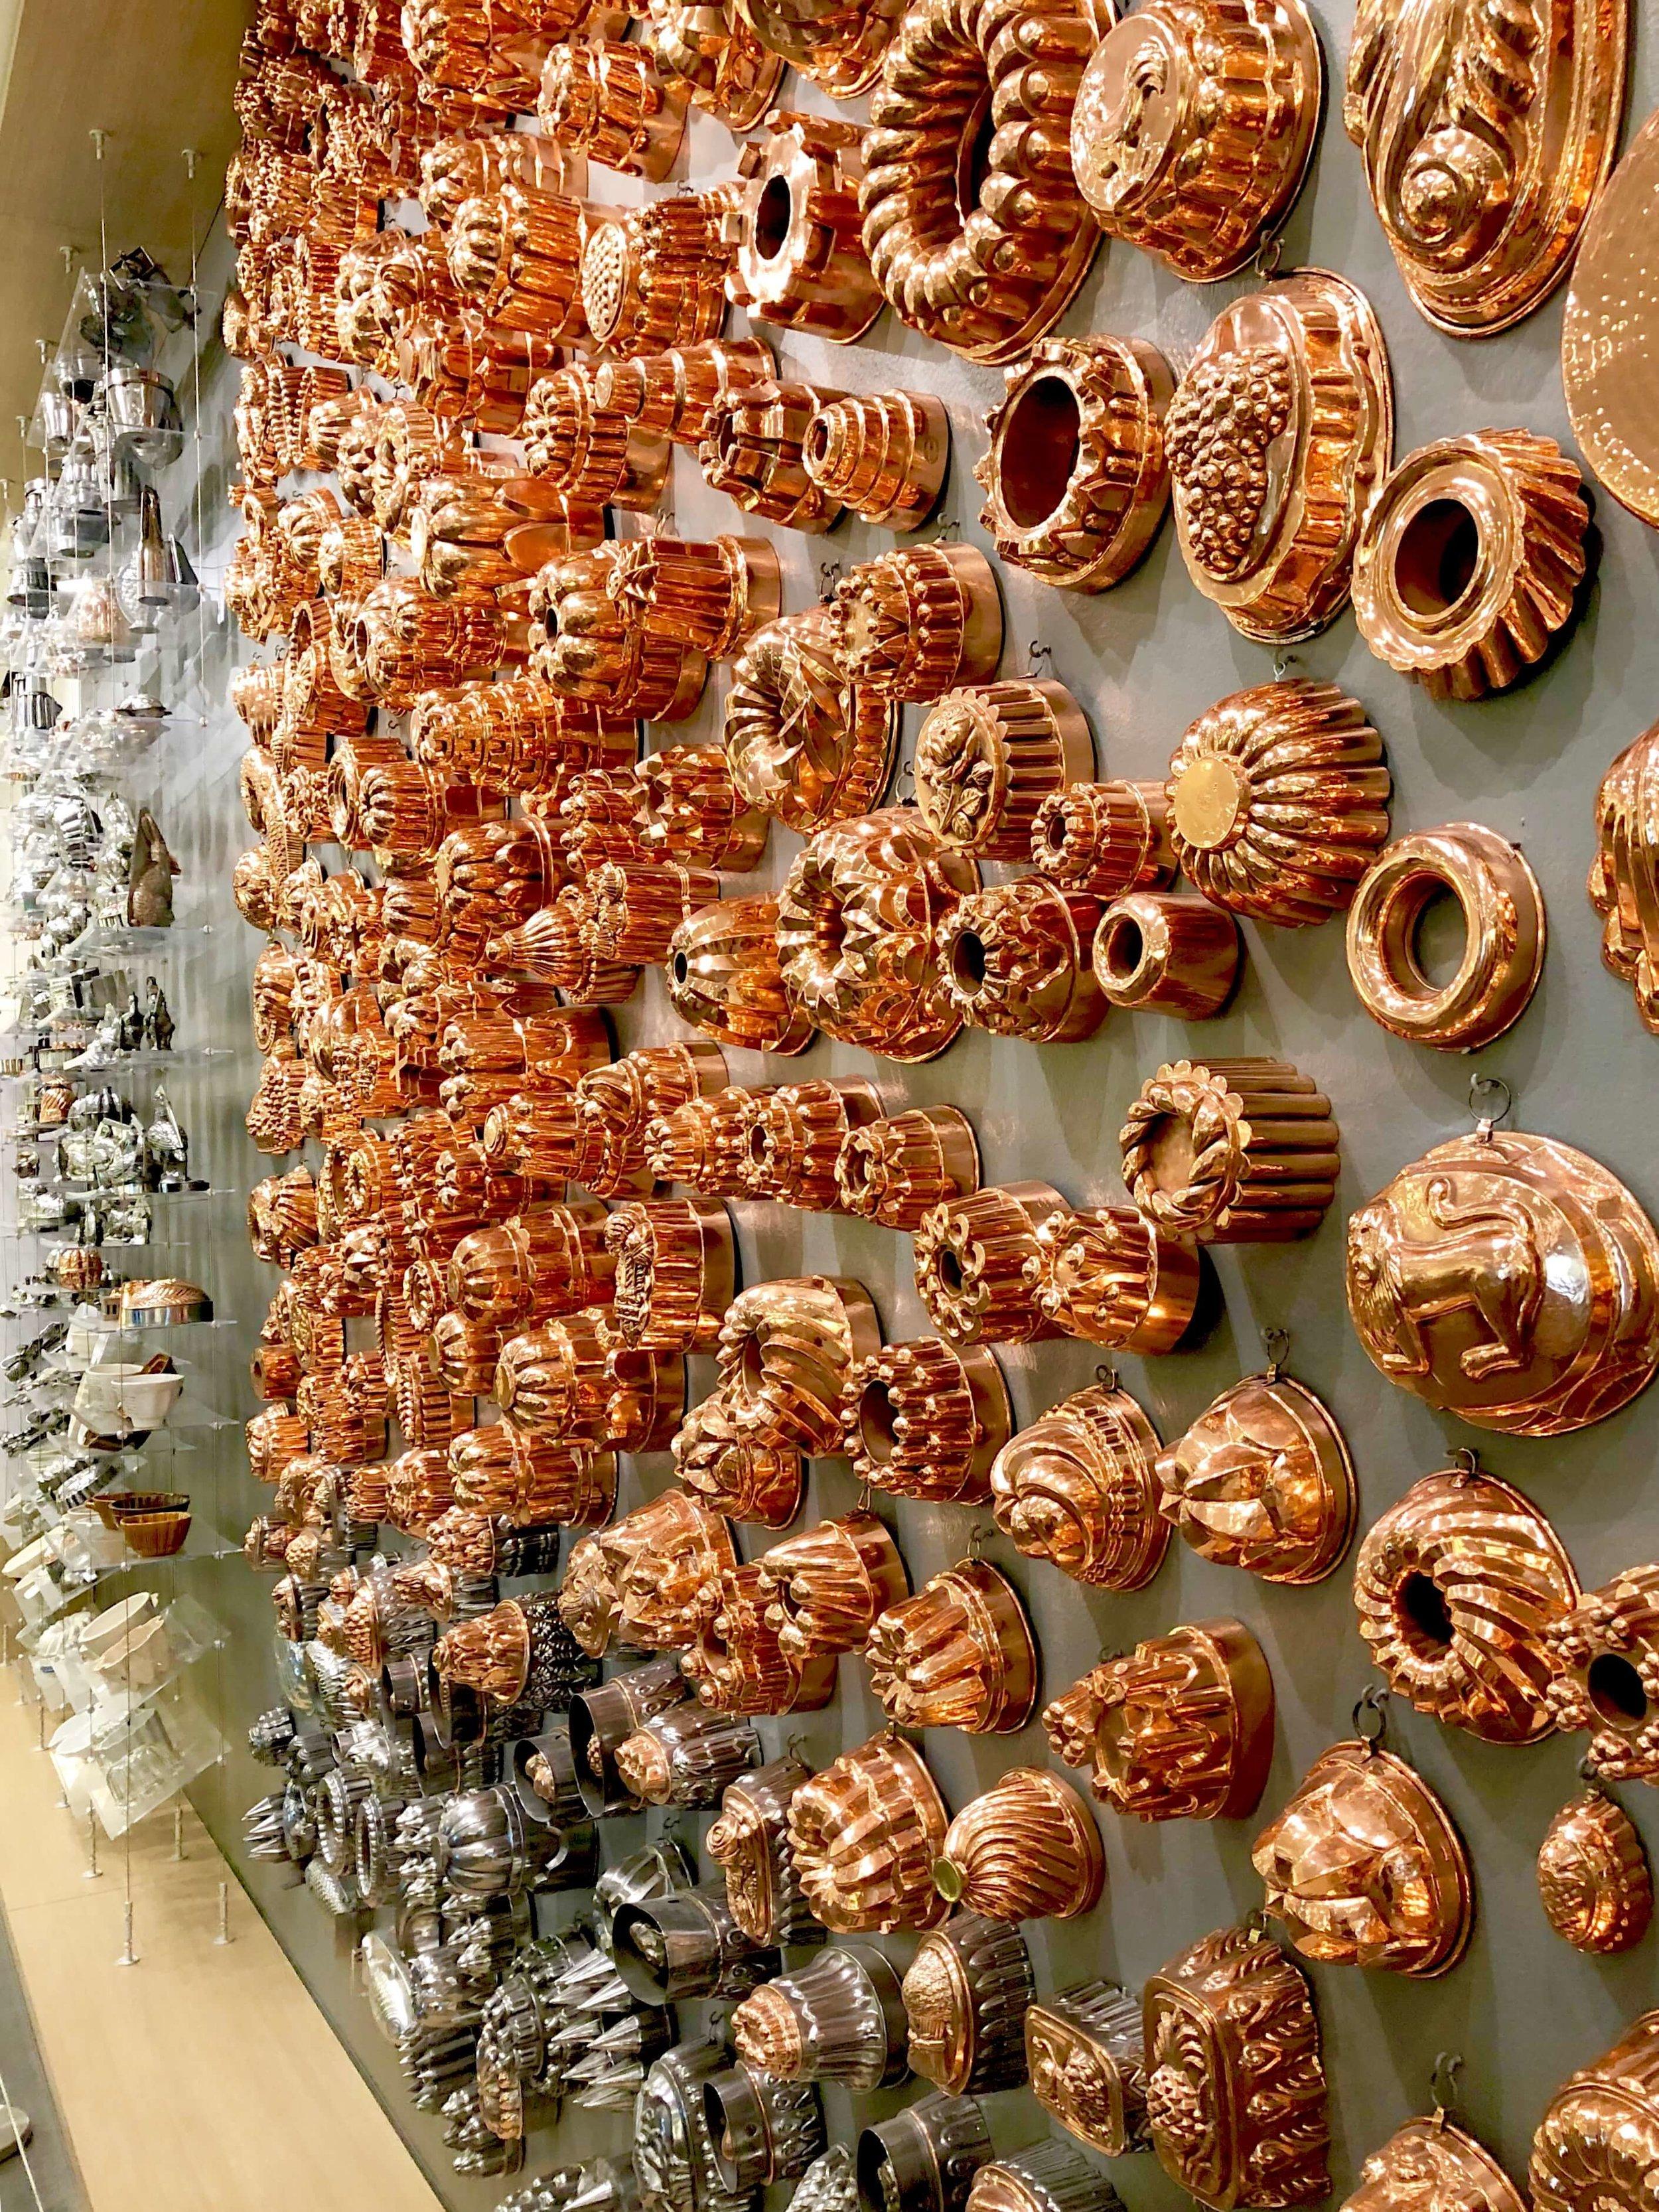 The most impressive wall of copper molds at the Chuck Williams Culinary Arts Museum, Culinary Institute of America Copia | Napa, California